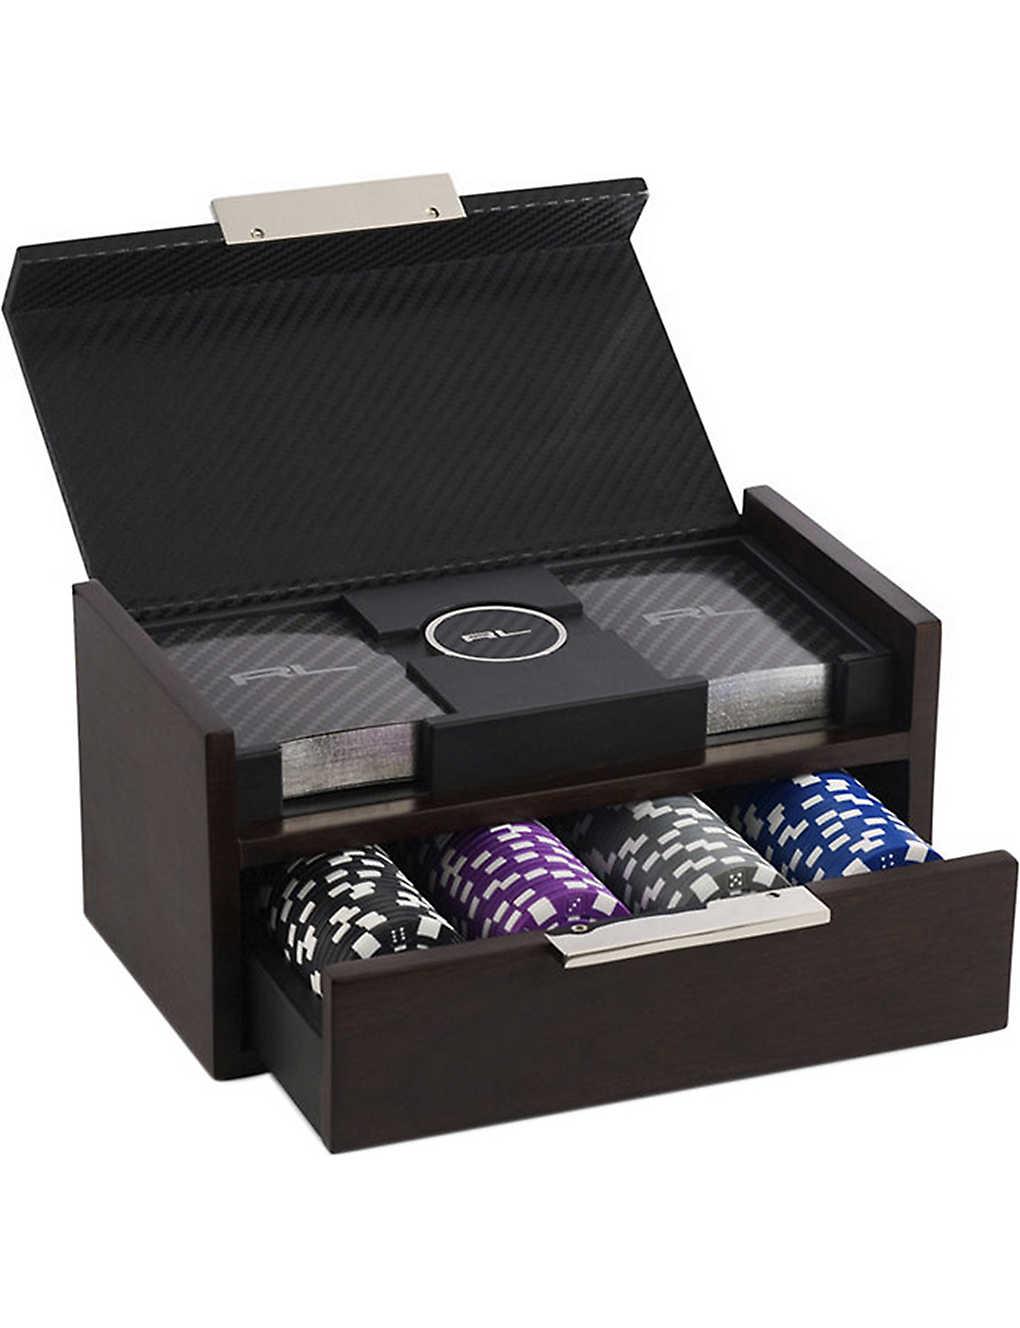 Ralph Lauren Home Sutton Wood And Leather Poker Set Selfridges Com # Muebles Ralph Lauren Espana